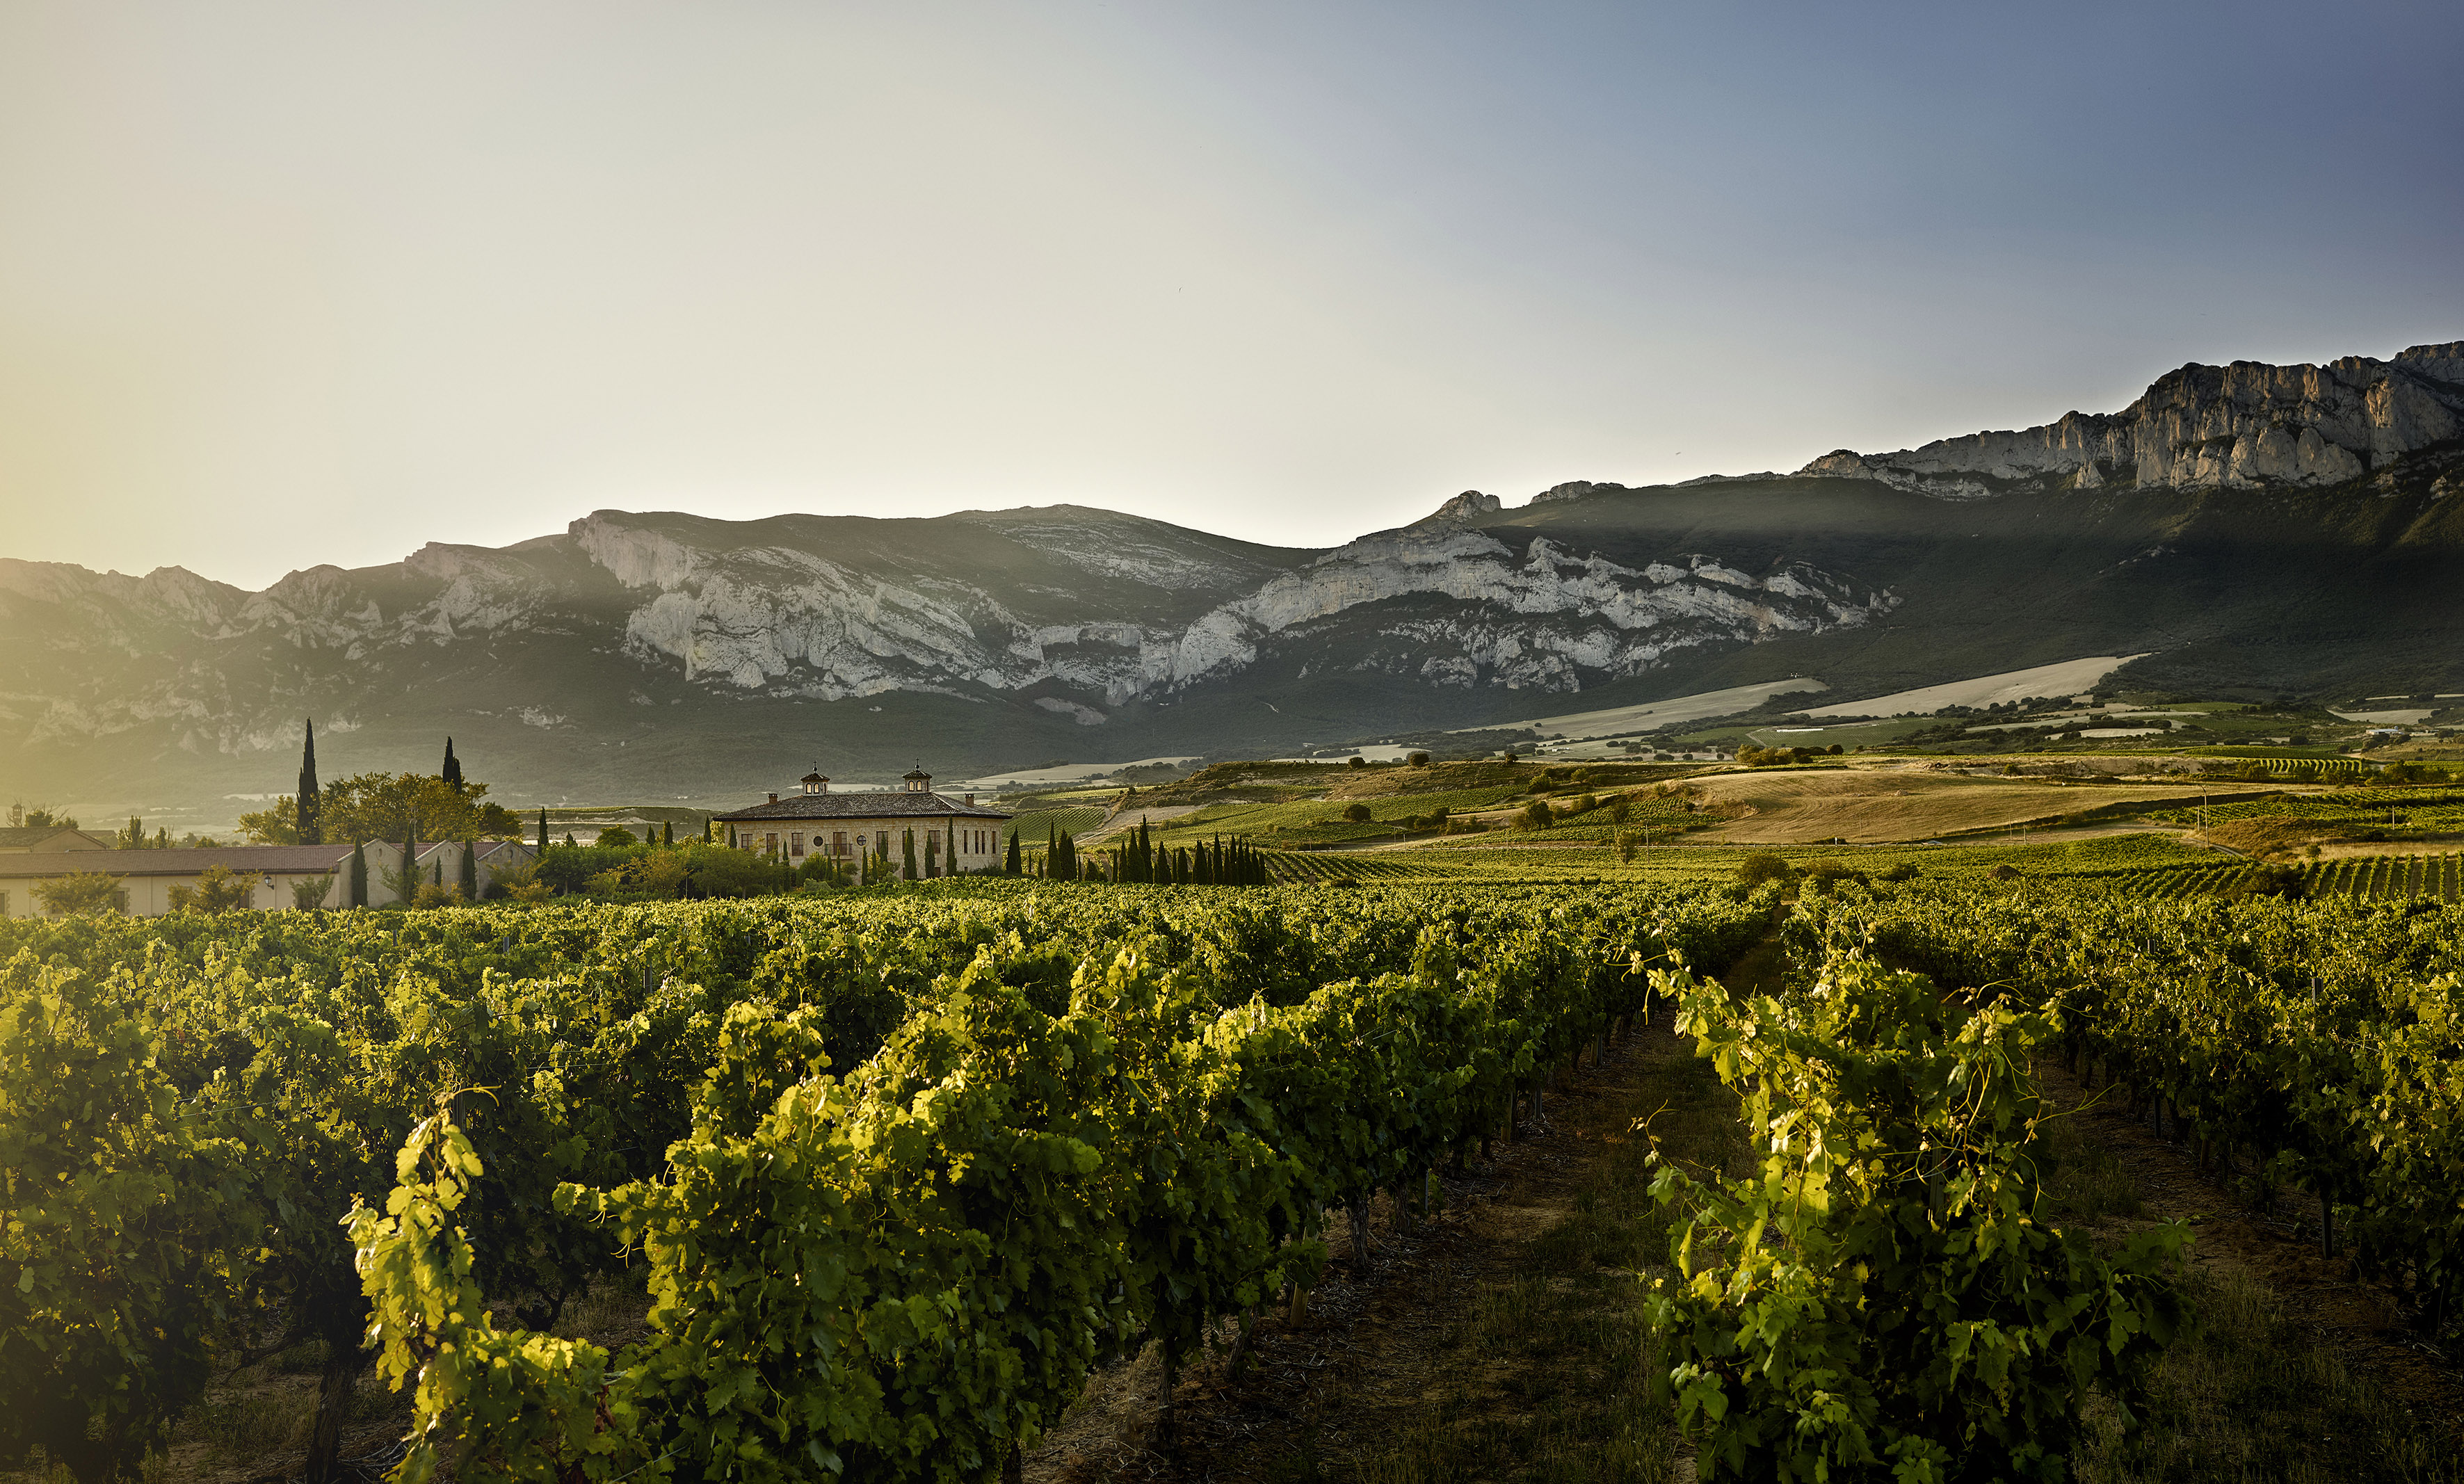 La Rioja Alta – Sticking to Tradition with a Modern Twist